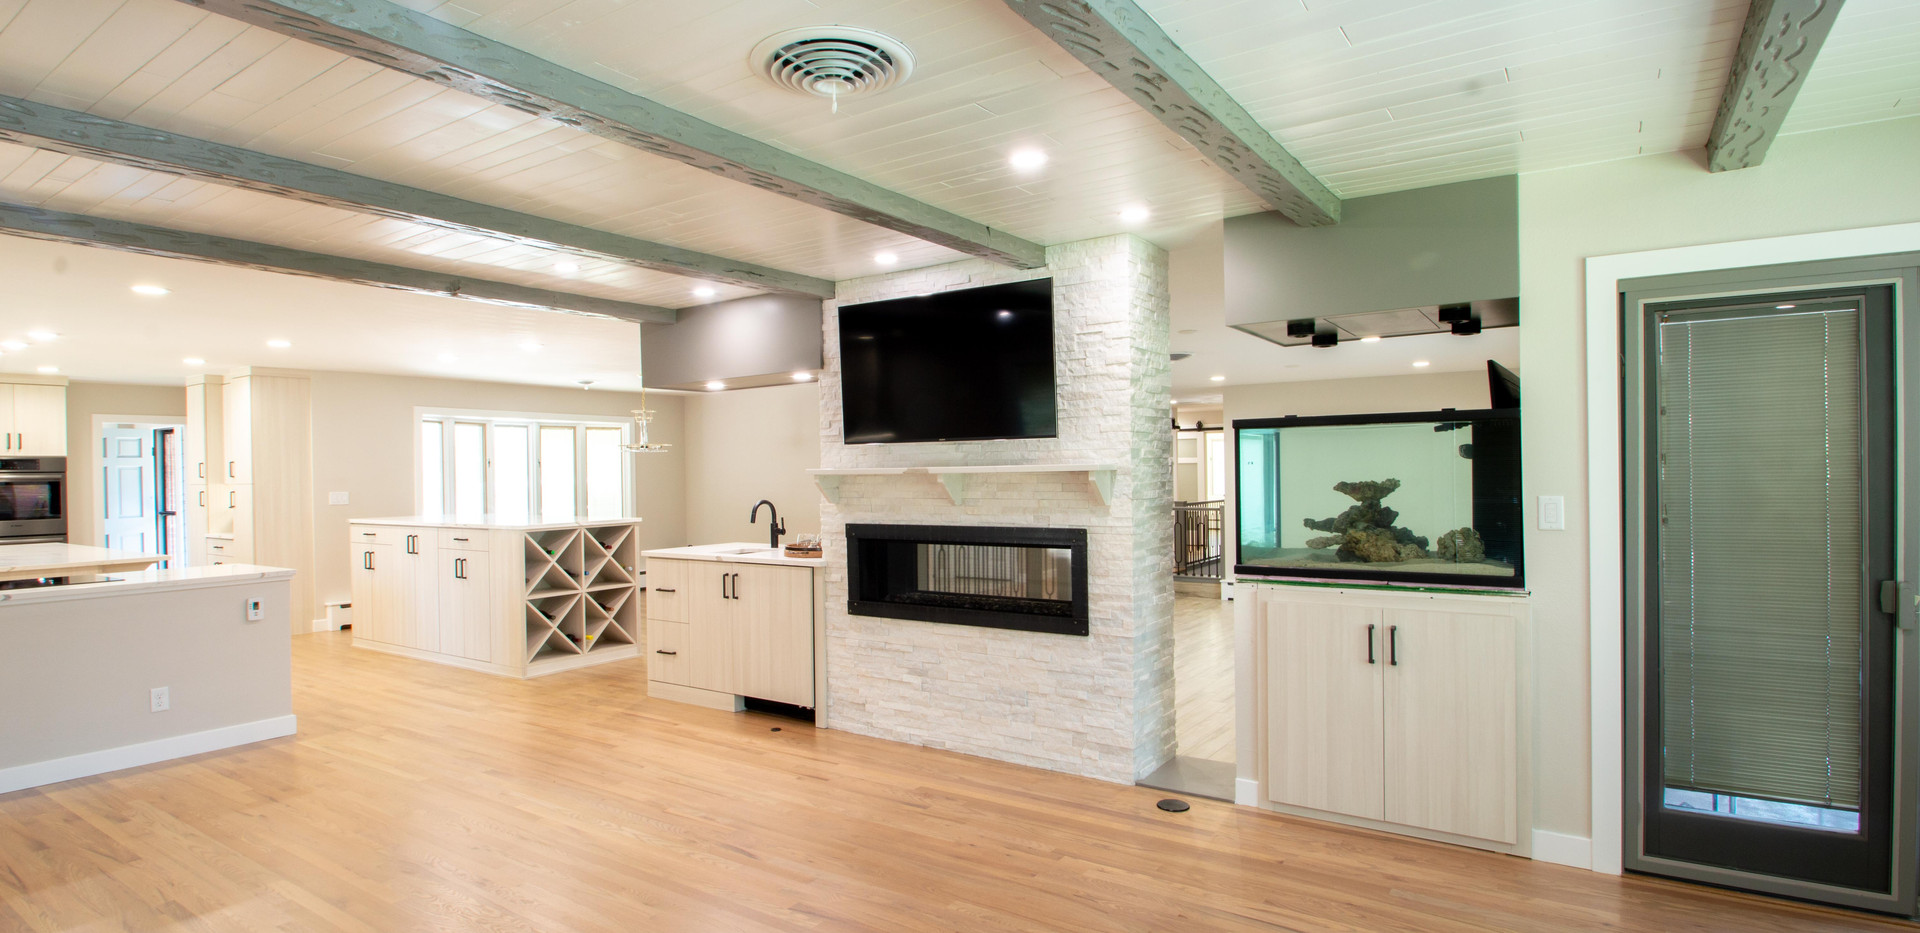 Fireplace and Fish Tank